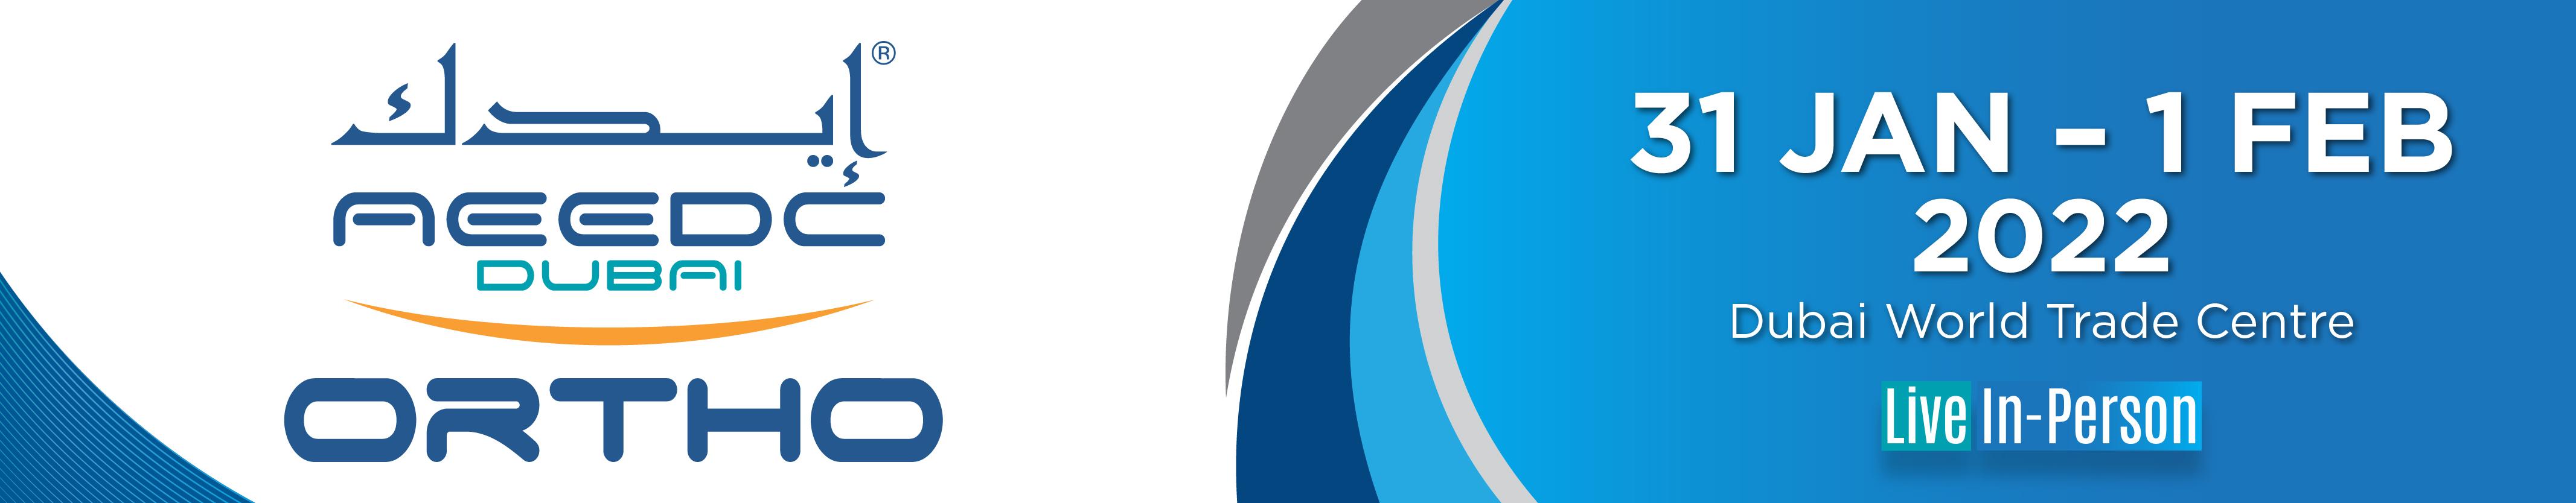 AEEDC Dubai World Orthodontic Conference 2022